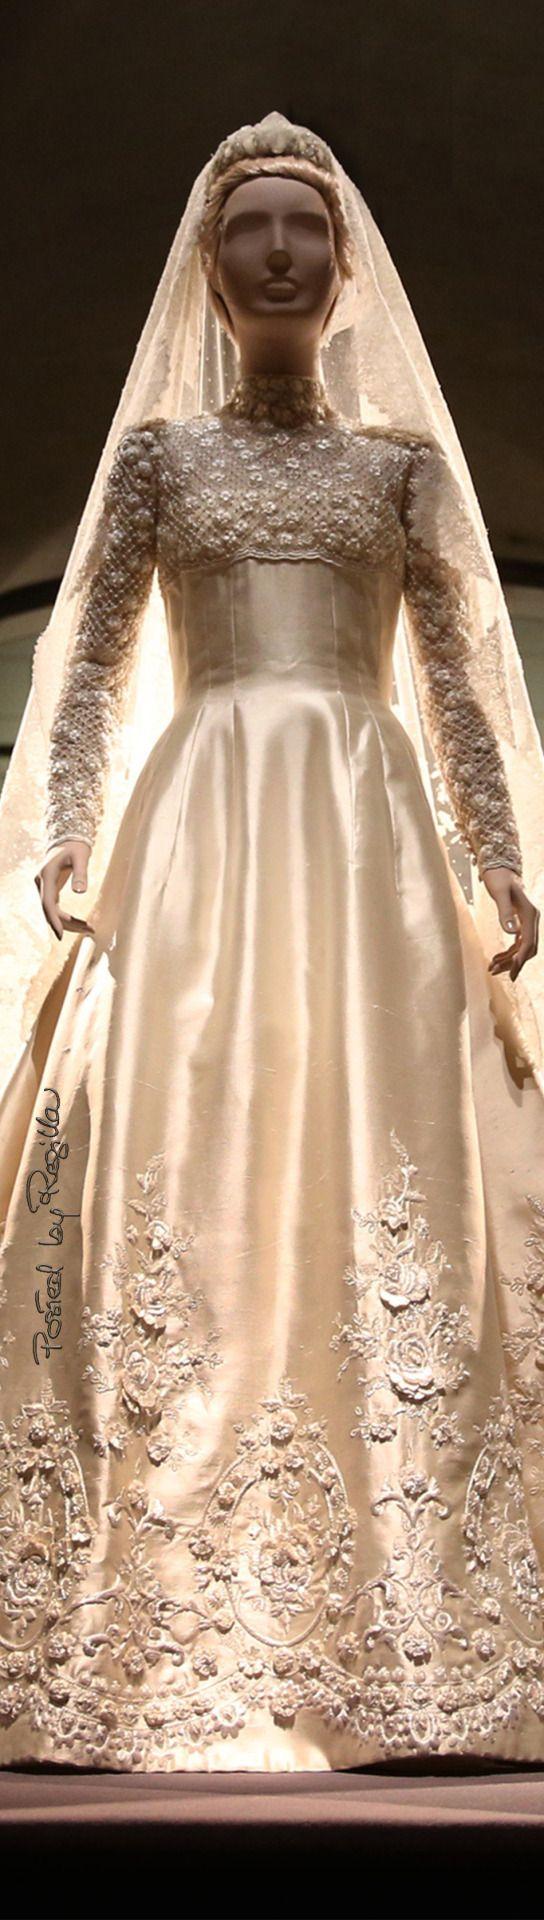 Regilla ⚜ Valentino, The wedding dress of Princess Marie-Chantal of Greece, 1995